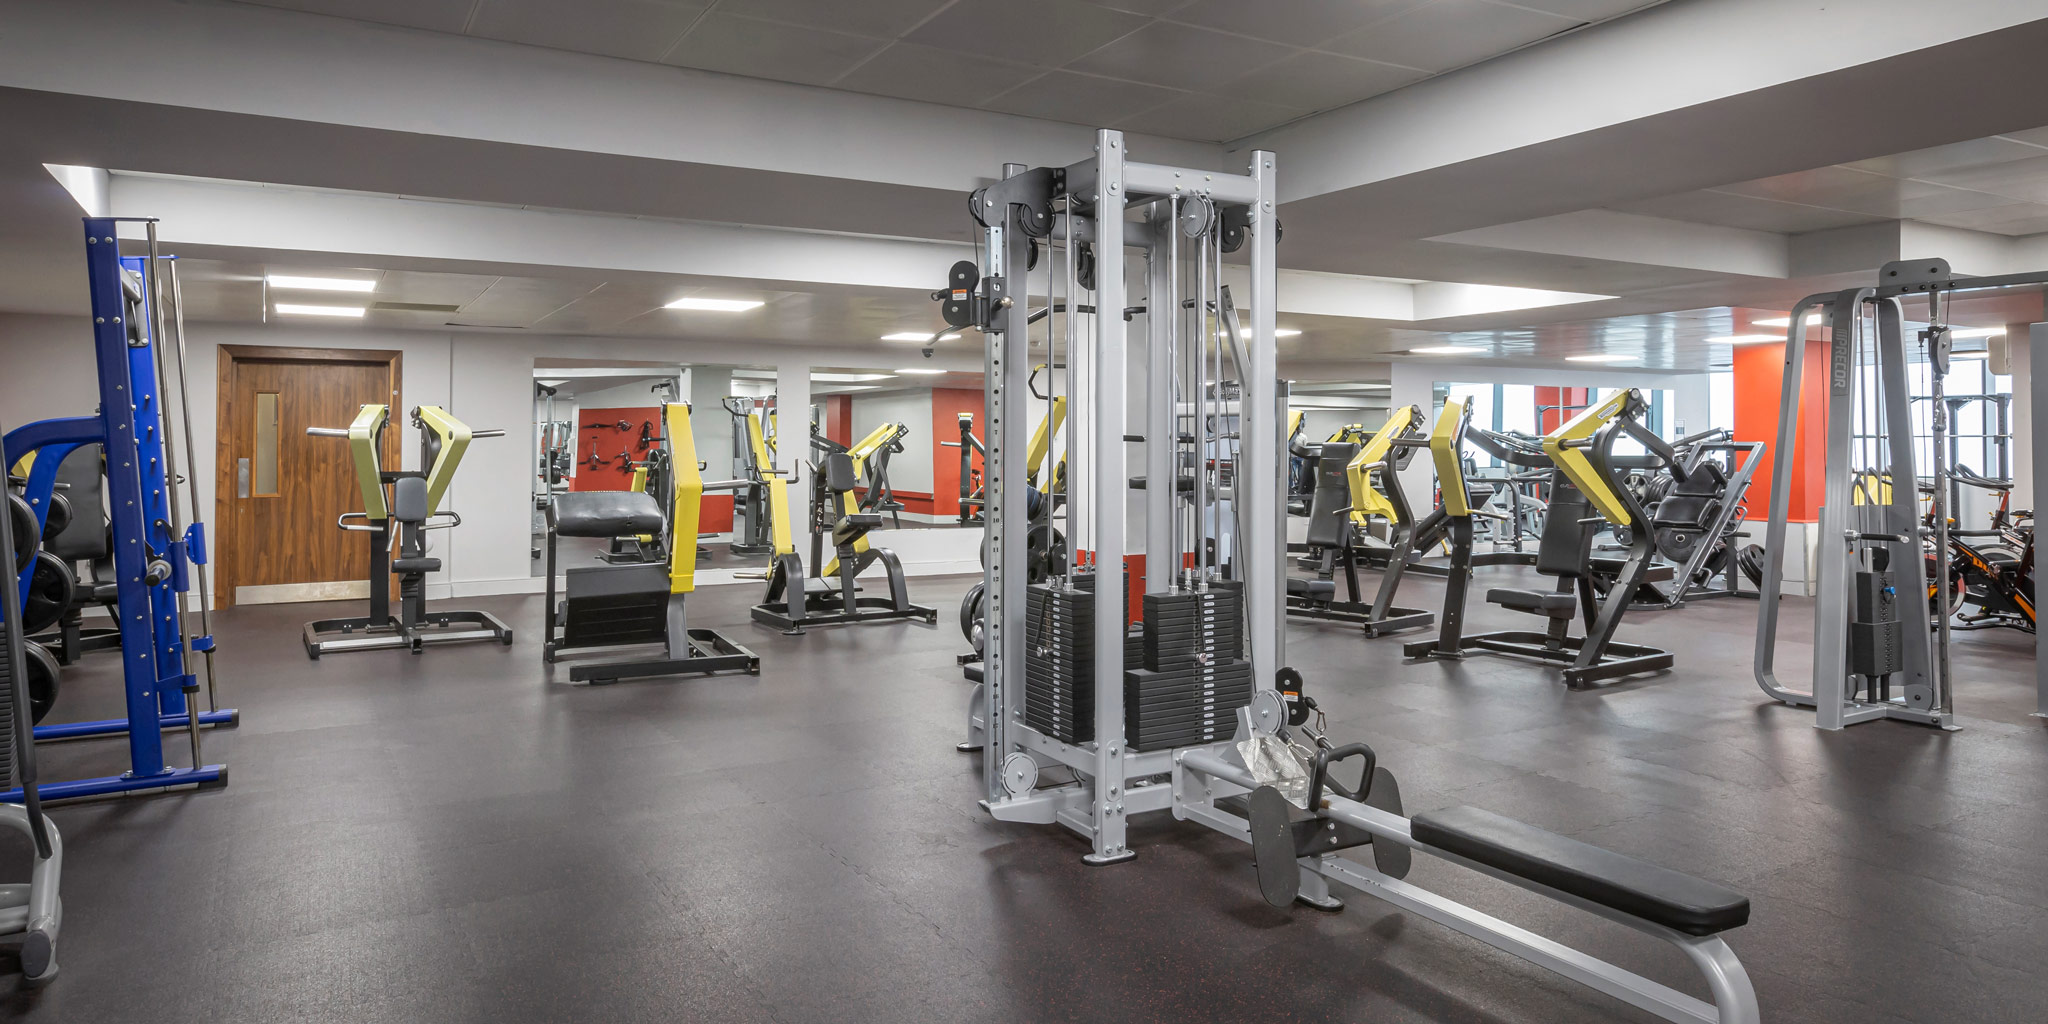 gym-equipment-Club-Vitae-Maldron-Hotel-Tallaght